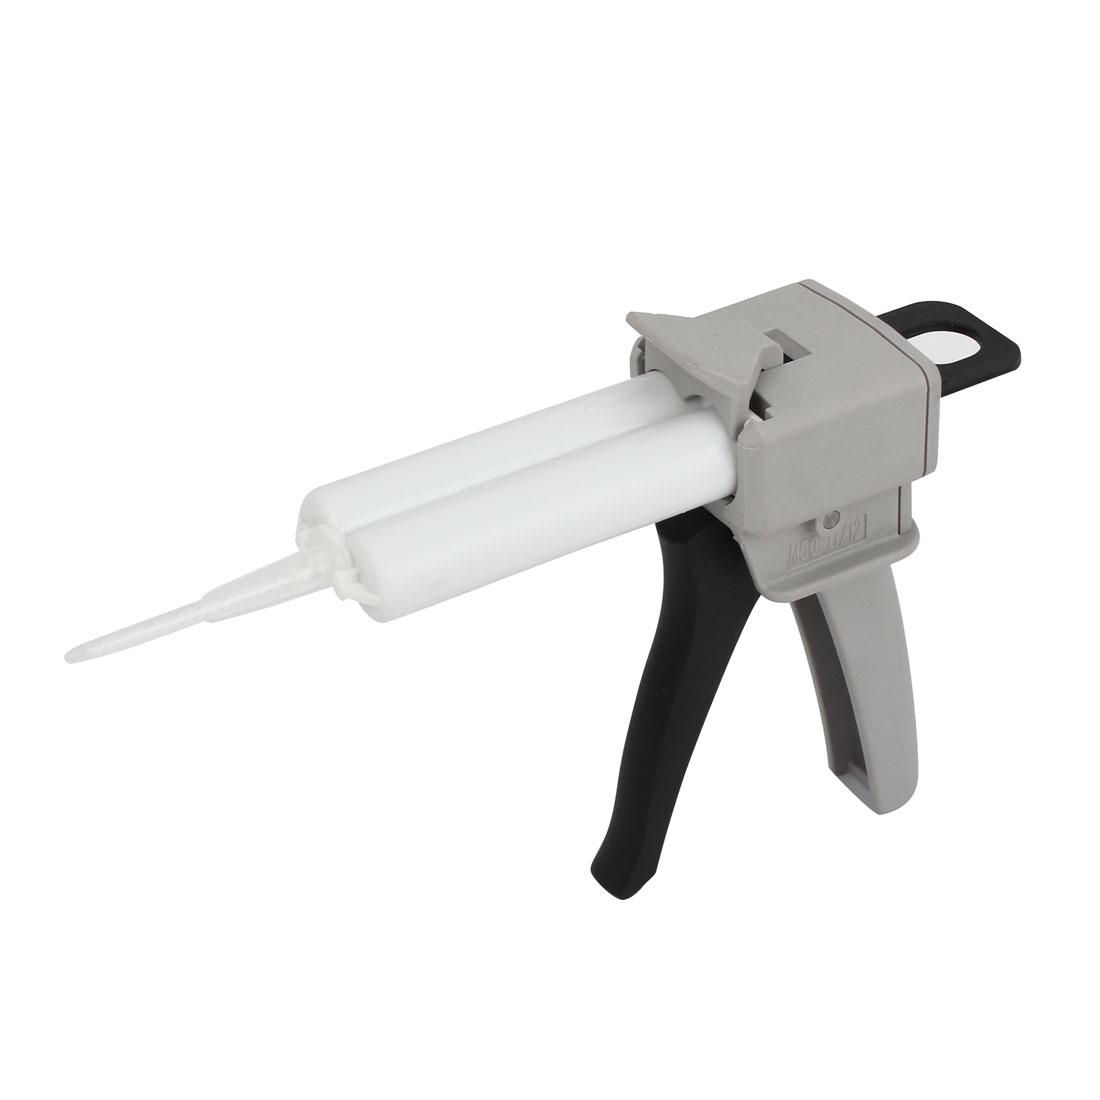 White Gray Black Plastic Triggered Glue Gun Handy Tool M50-11/12